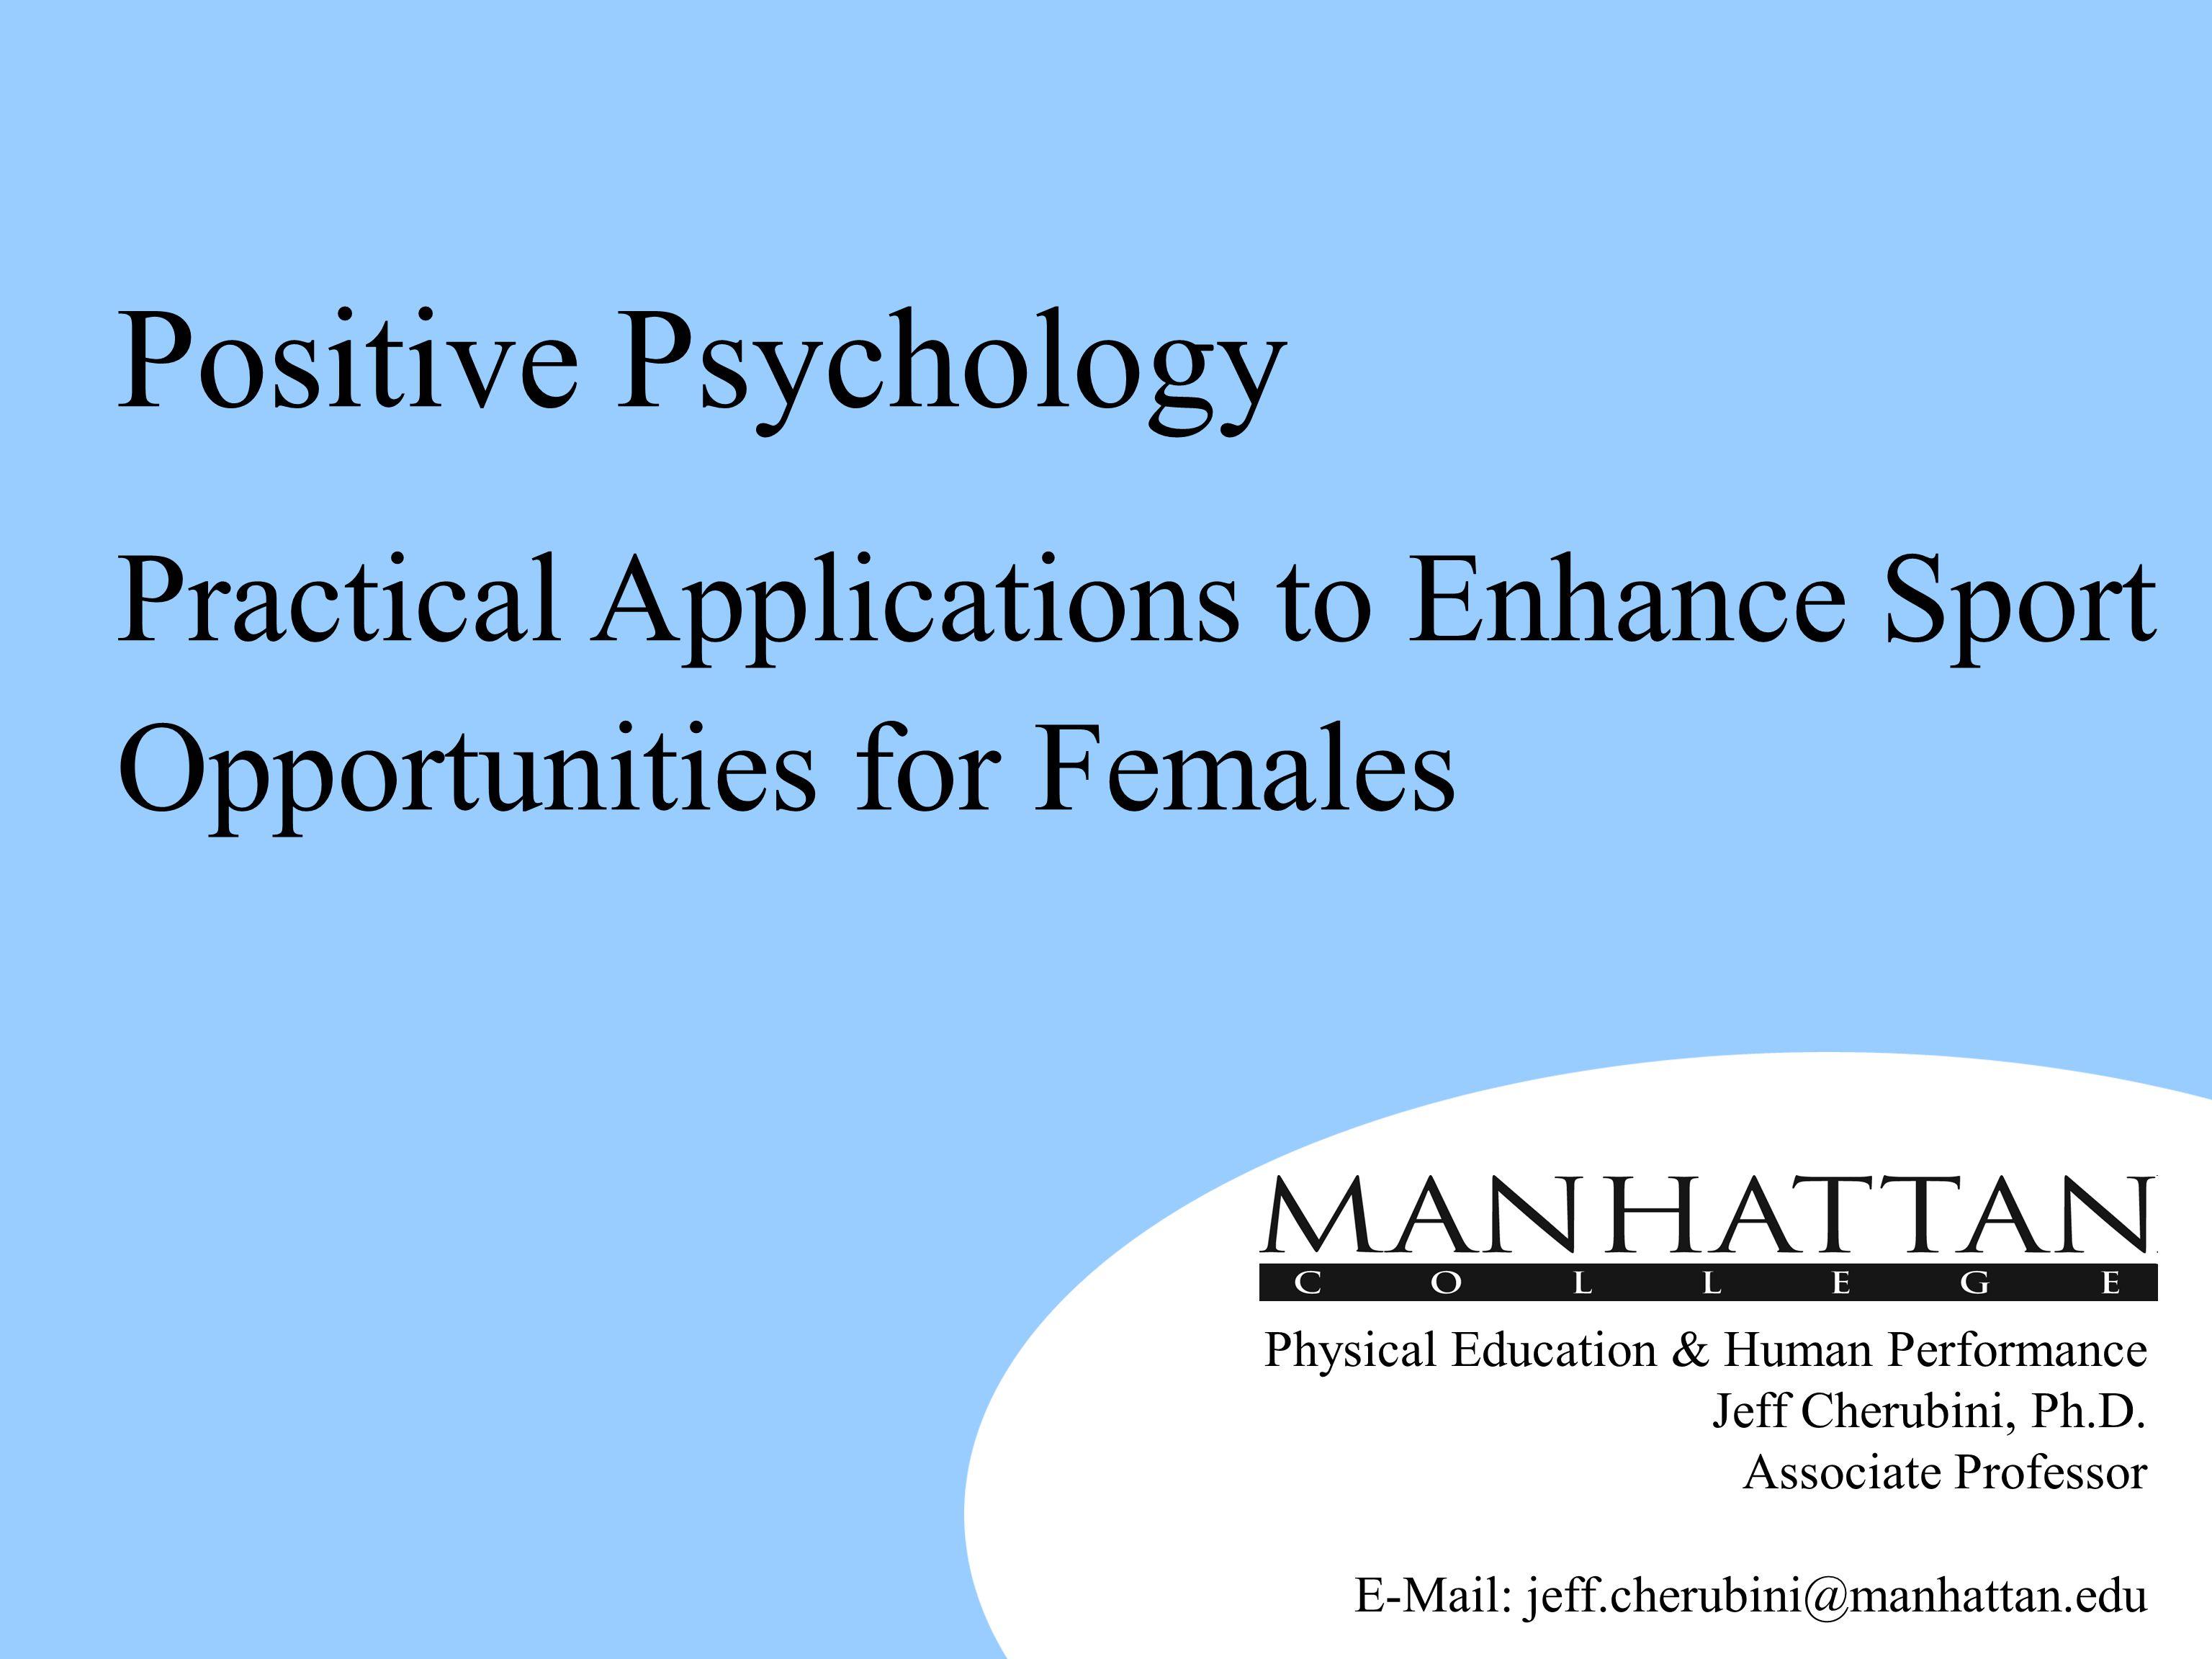 Physical Education & Human Performance Jeff Cherubini, Ph.D.